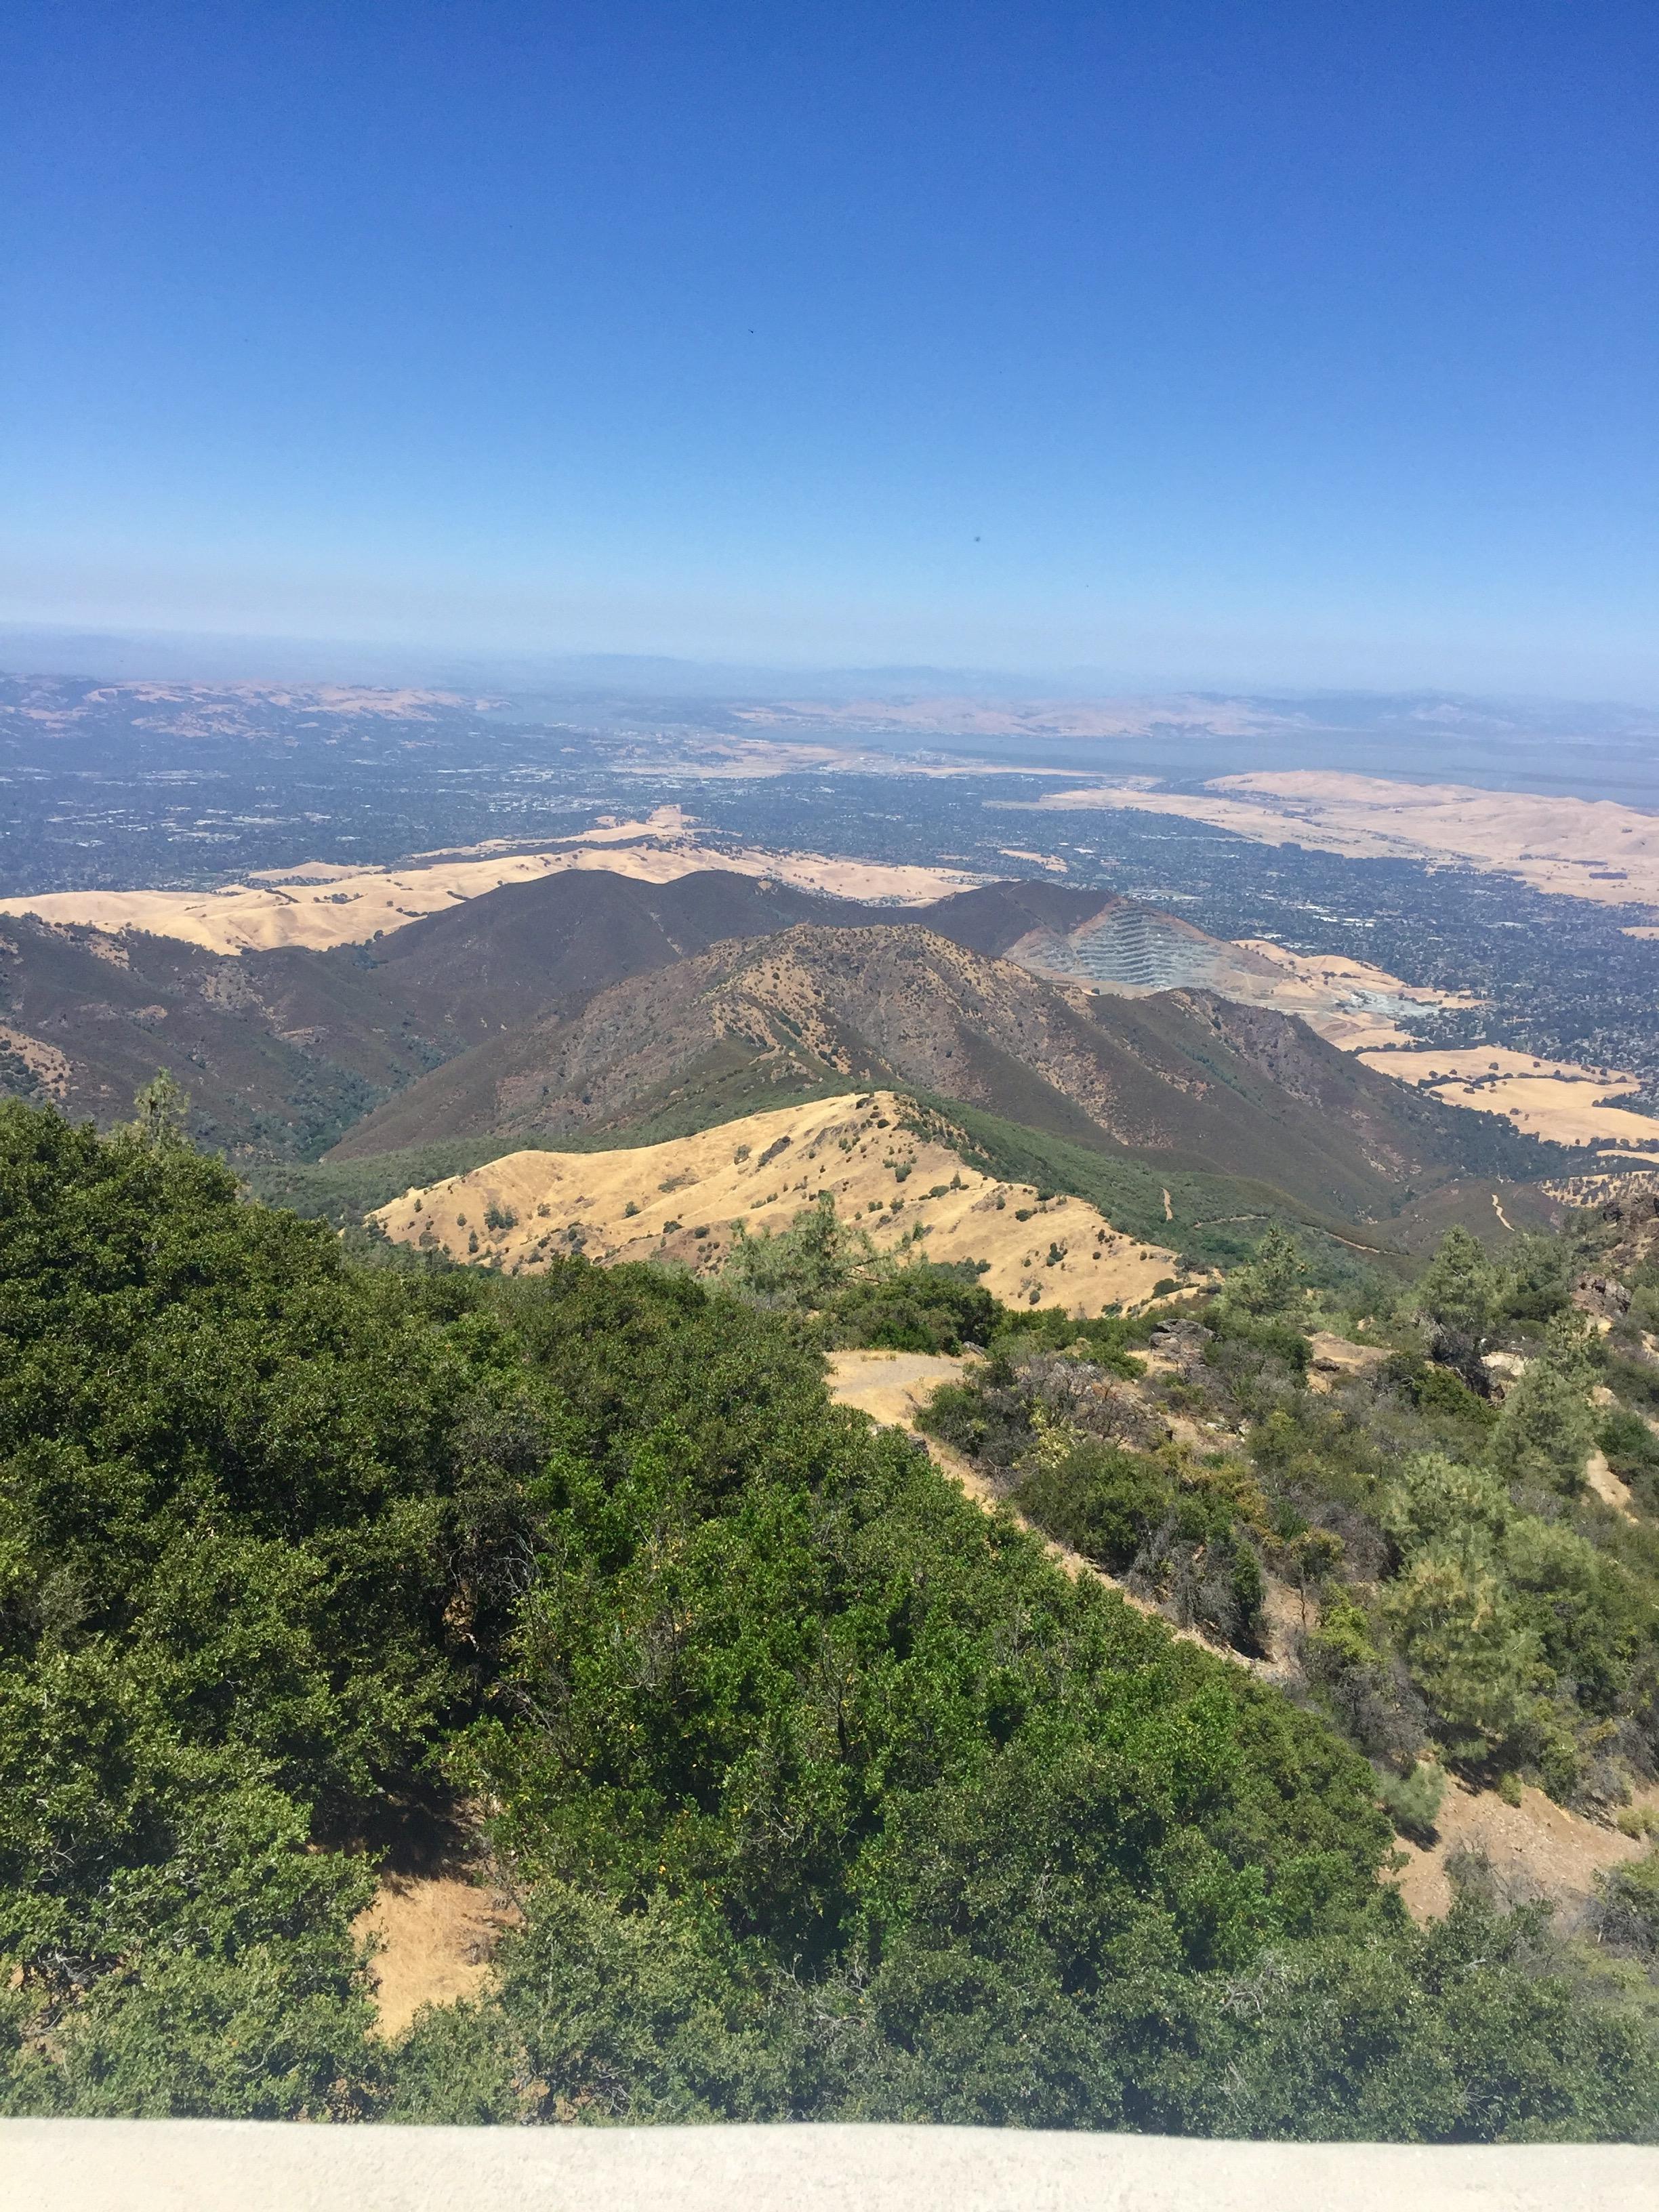 I took that pic in Mount Diablo last July!